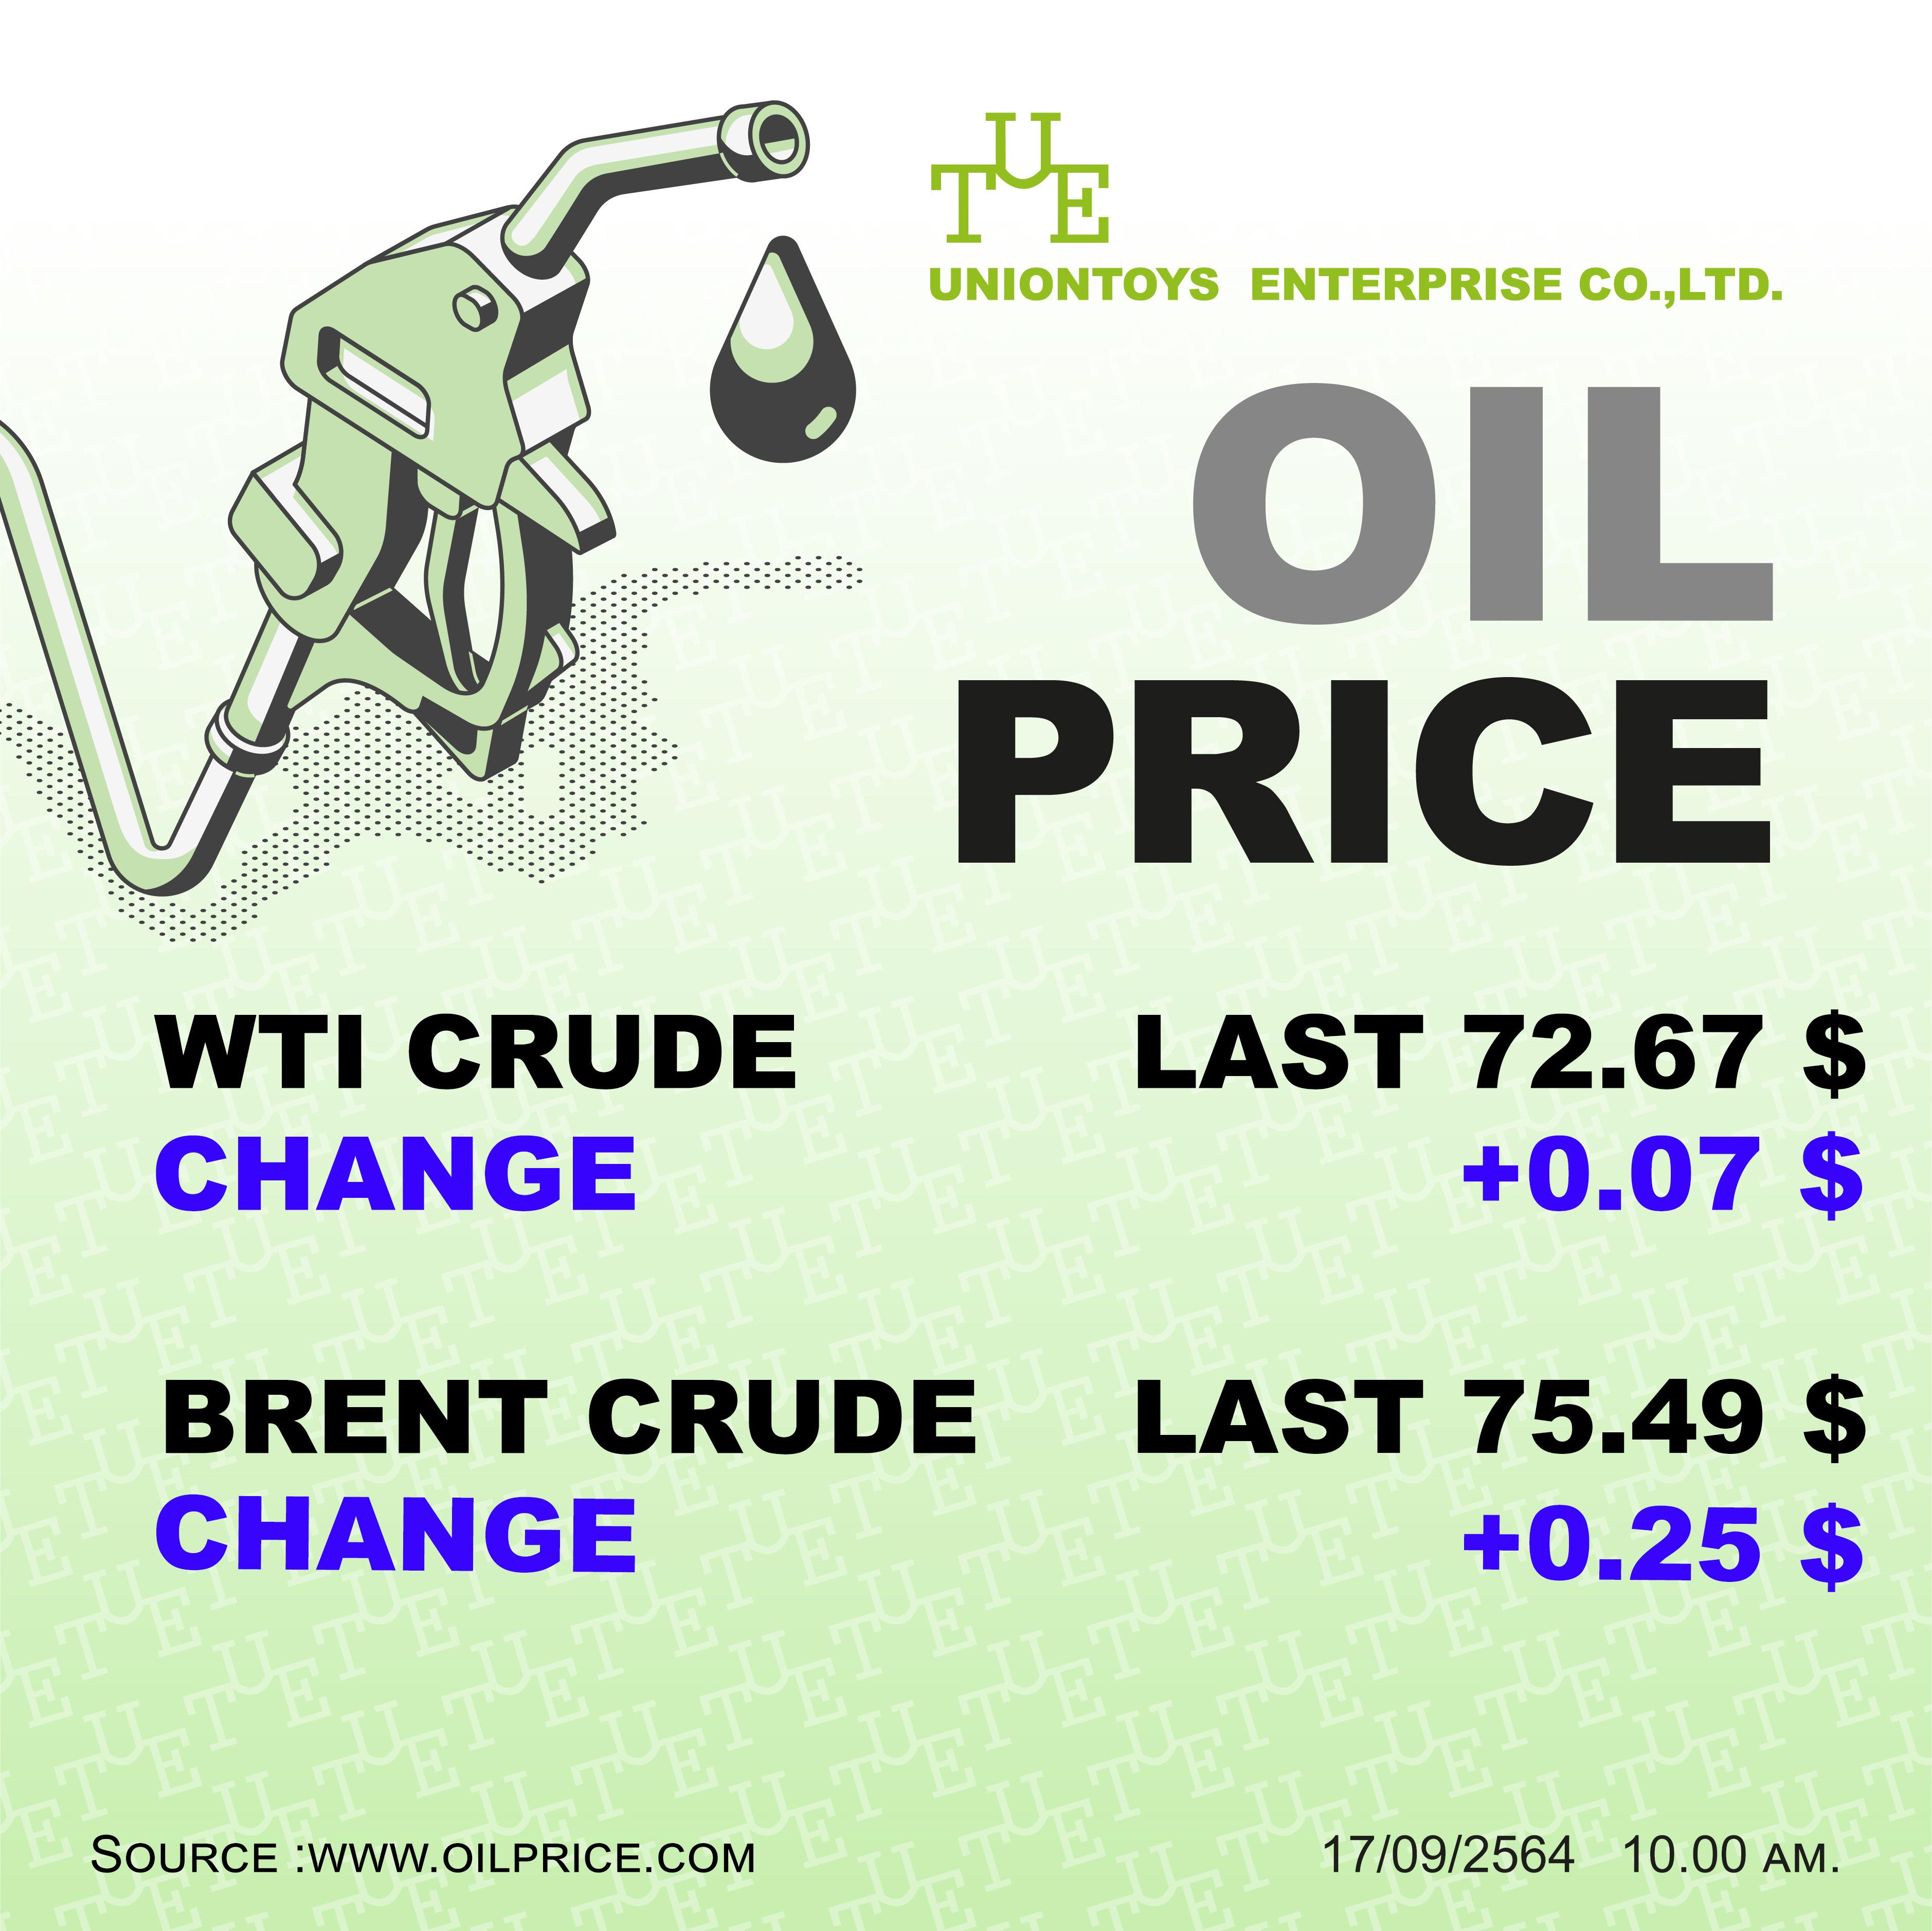 Uniontoys Oil Price Update - 19-09-2021